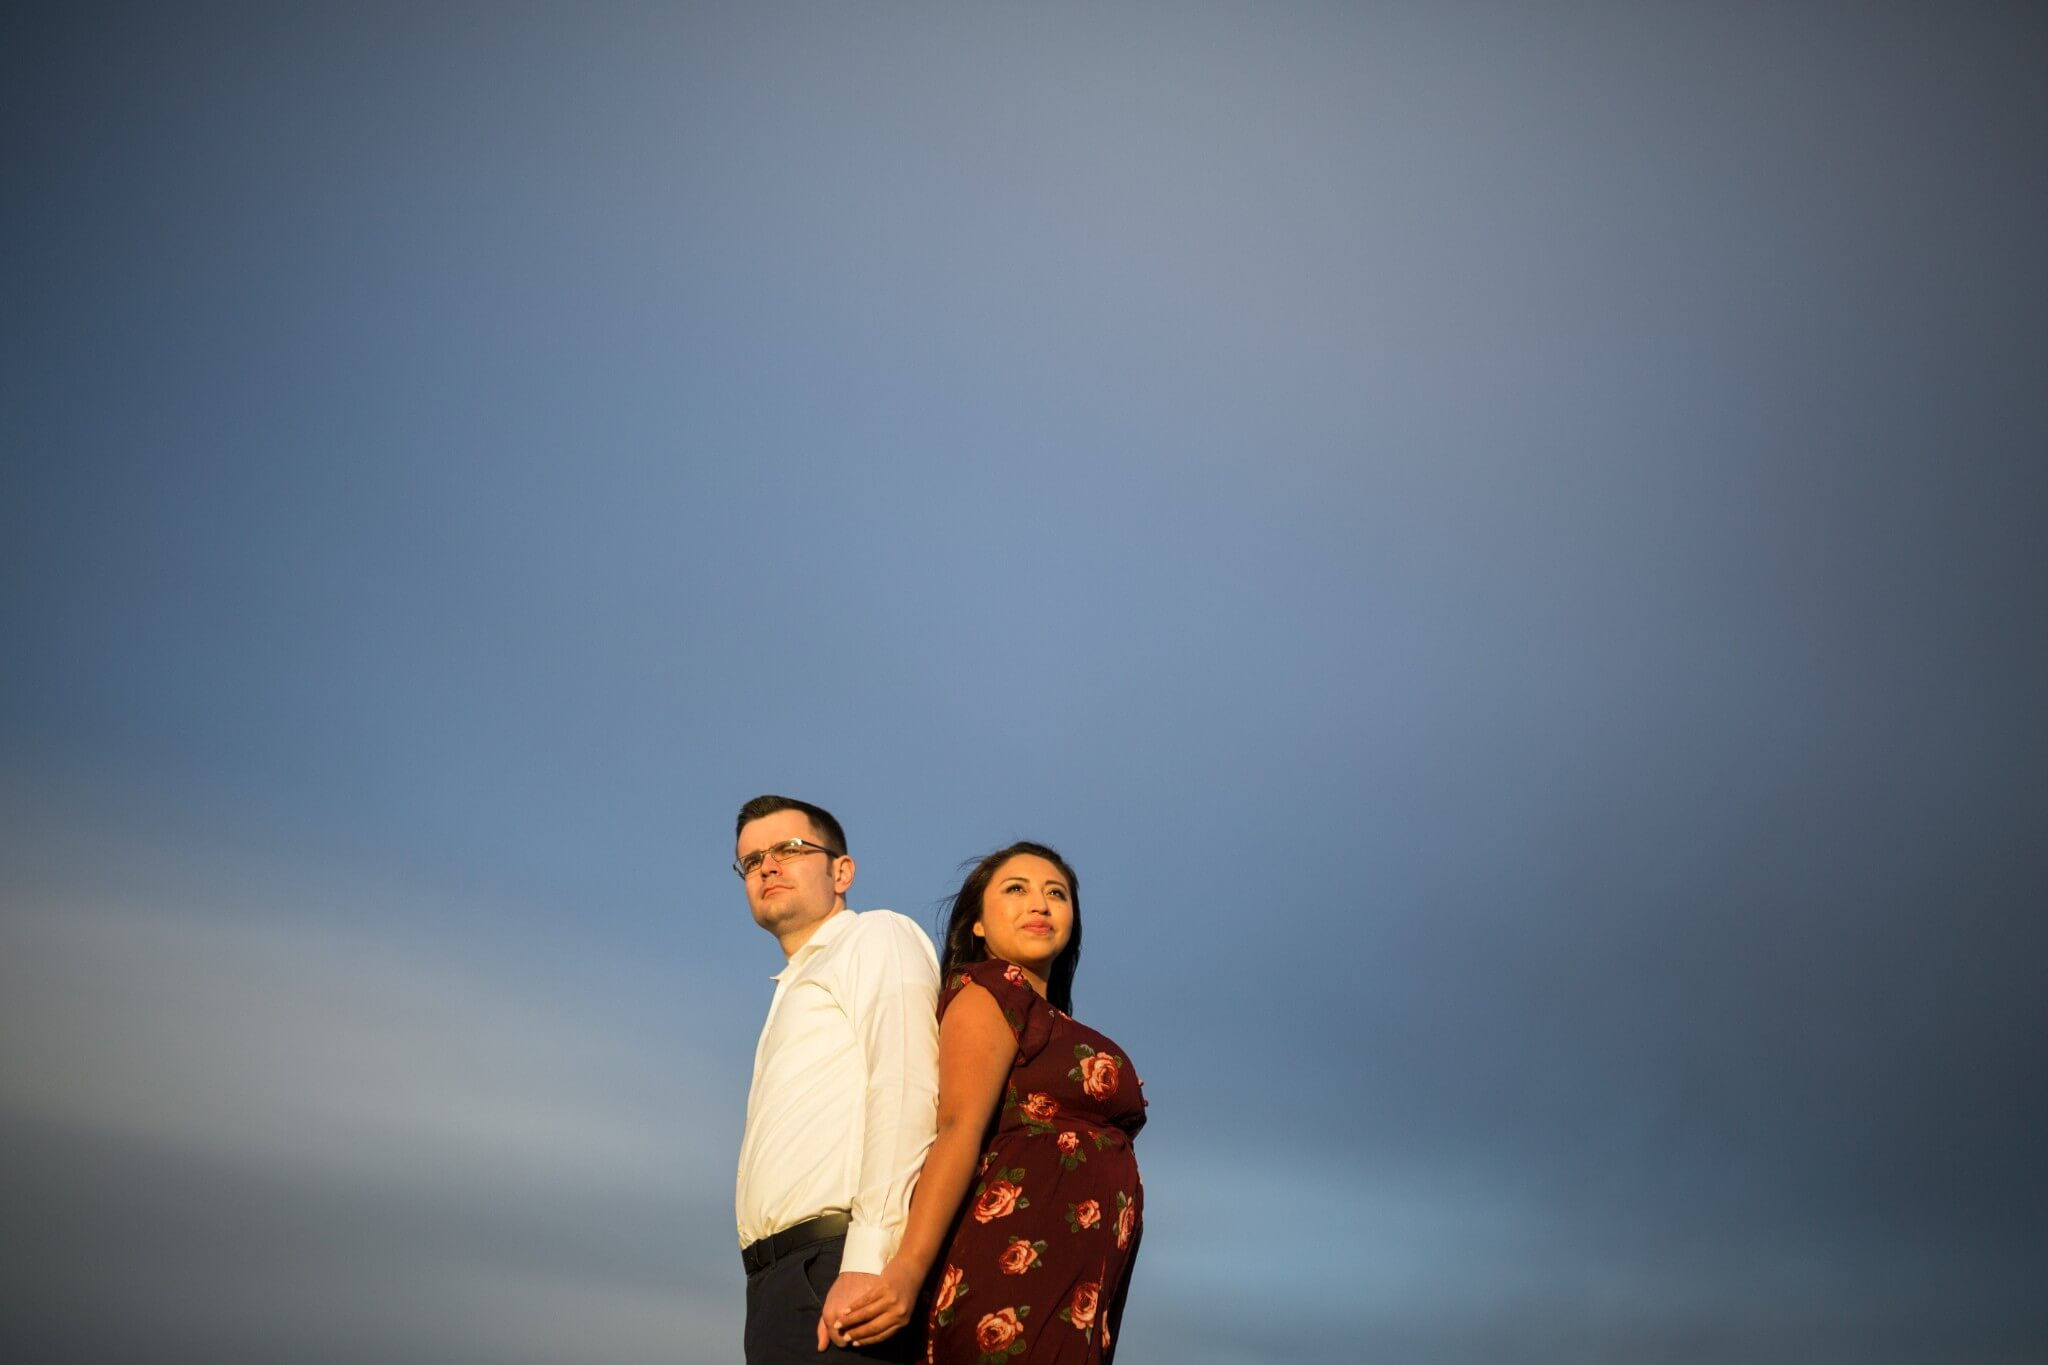 Lesly & Michael Vantage Engagement by Bill Weisgerber Spokane Photographer (47 of 71).jpg